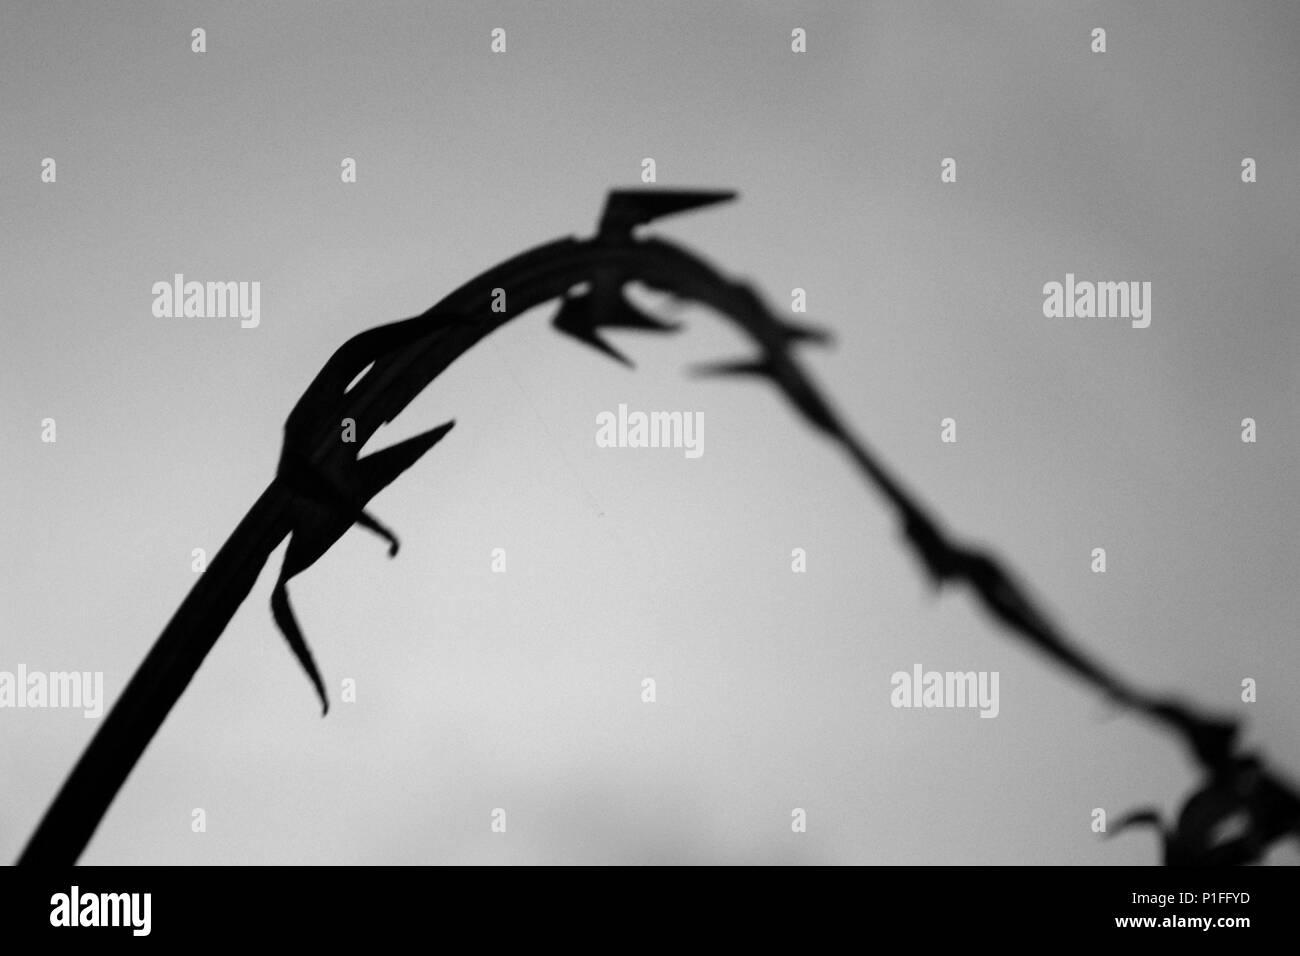 Bending Metal Stockfotos & Bending Metal Bilder - Alamy